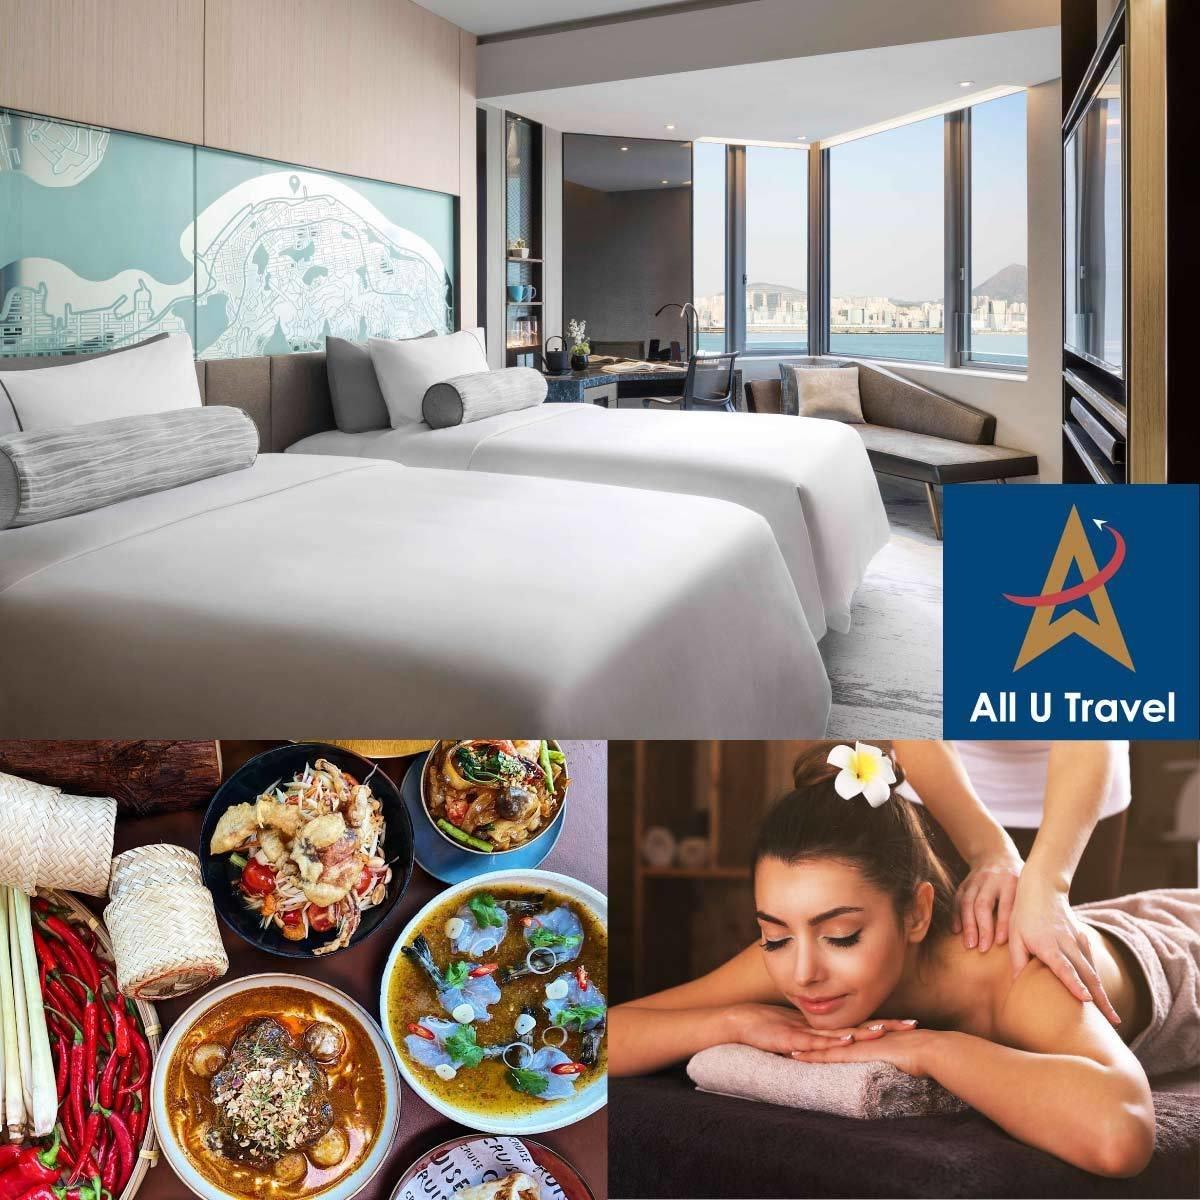 1 Set - Hyatt Centric Victoria Harbour Hong Kong ''We Miss Thailand'' Room Package (Mon - Thu, Sun & PHs)